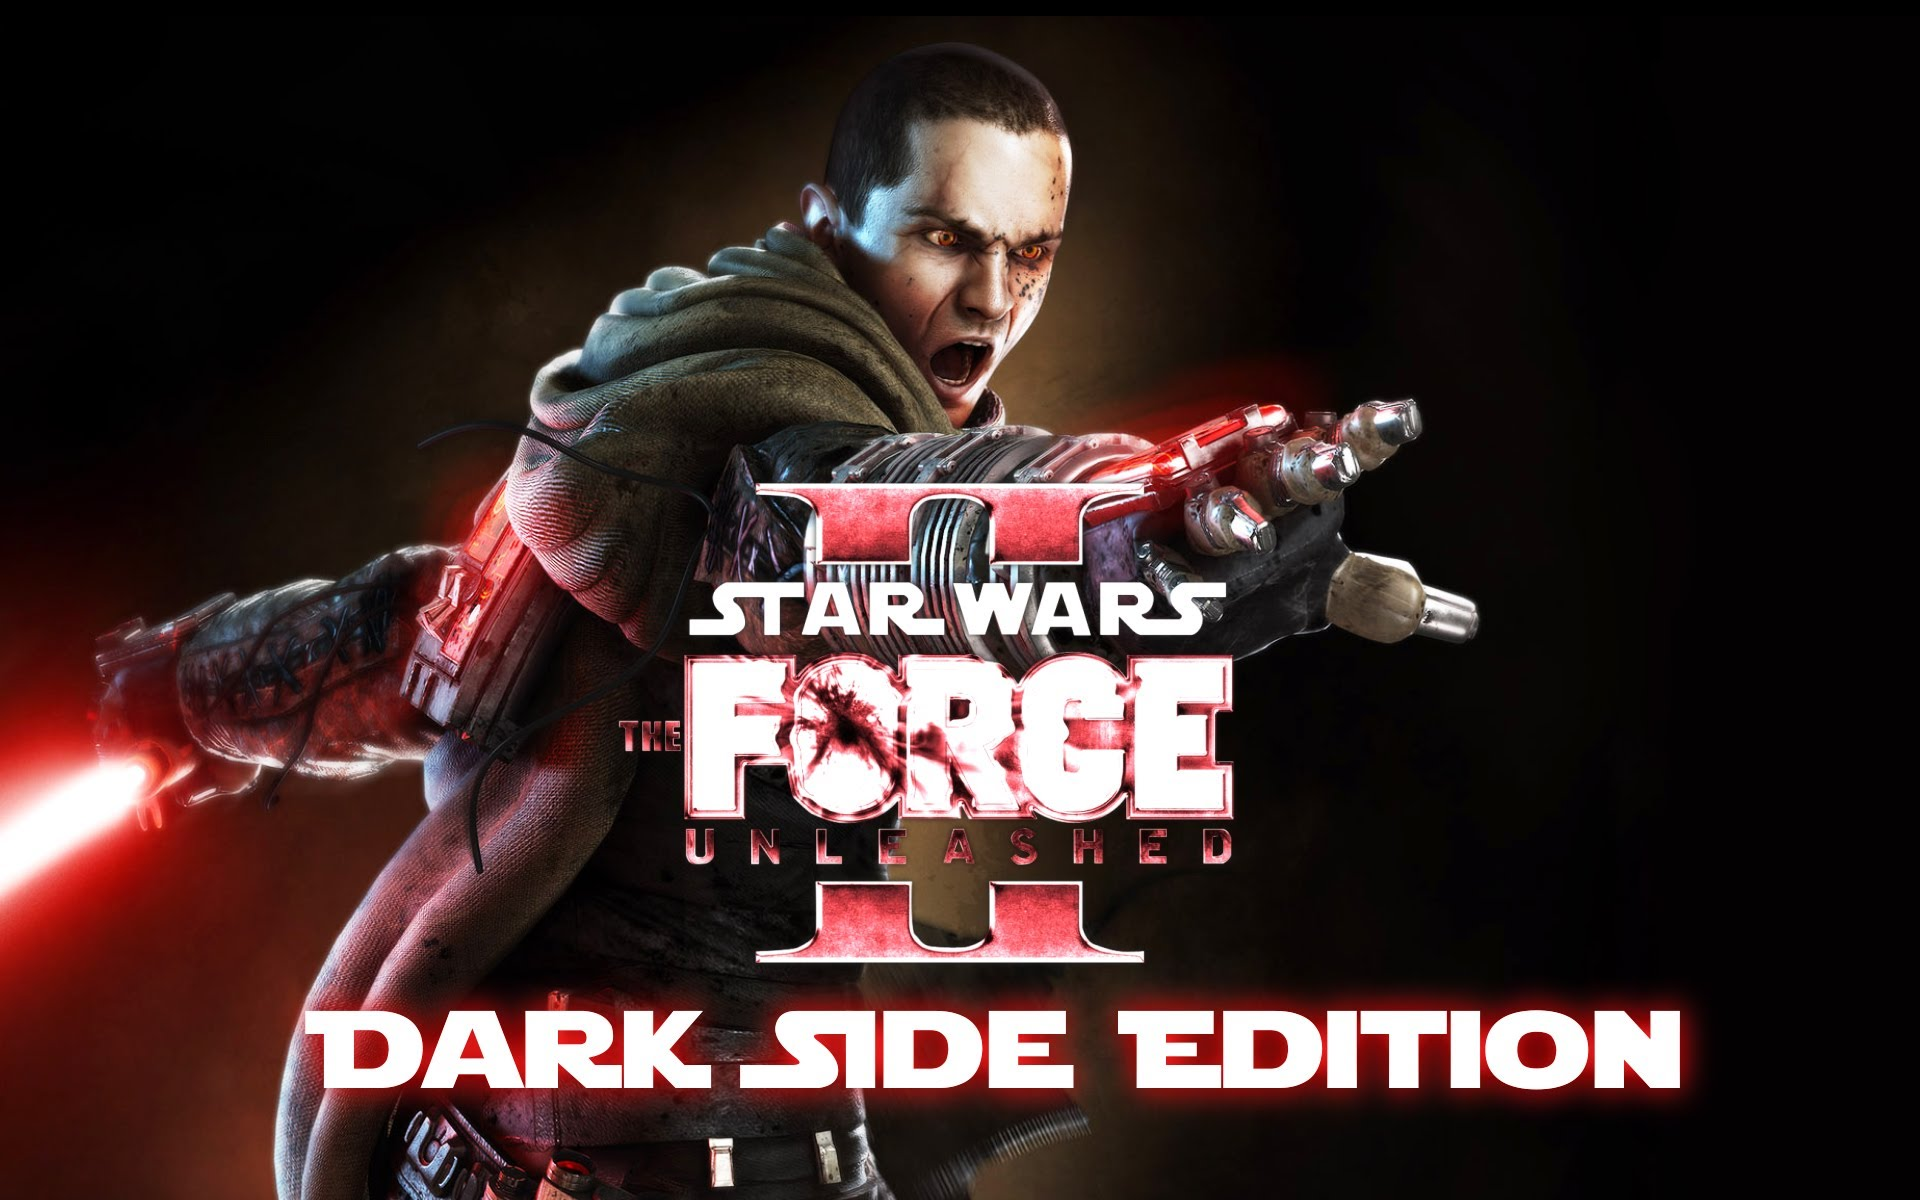 Star Wars Force Unleashed 2 Dark Side Edition Game Movie 1080p Star Wars Star Wars Awesome Star Wars Movie